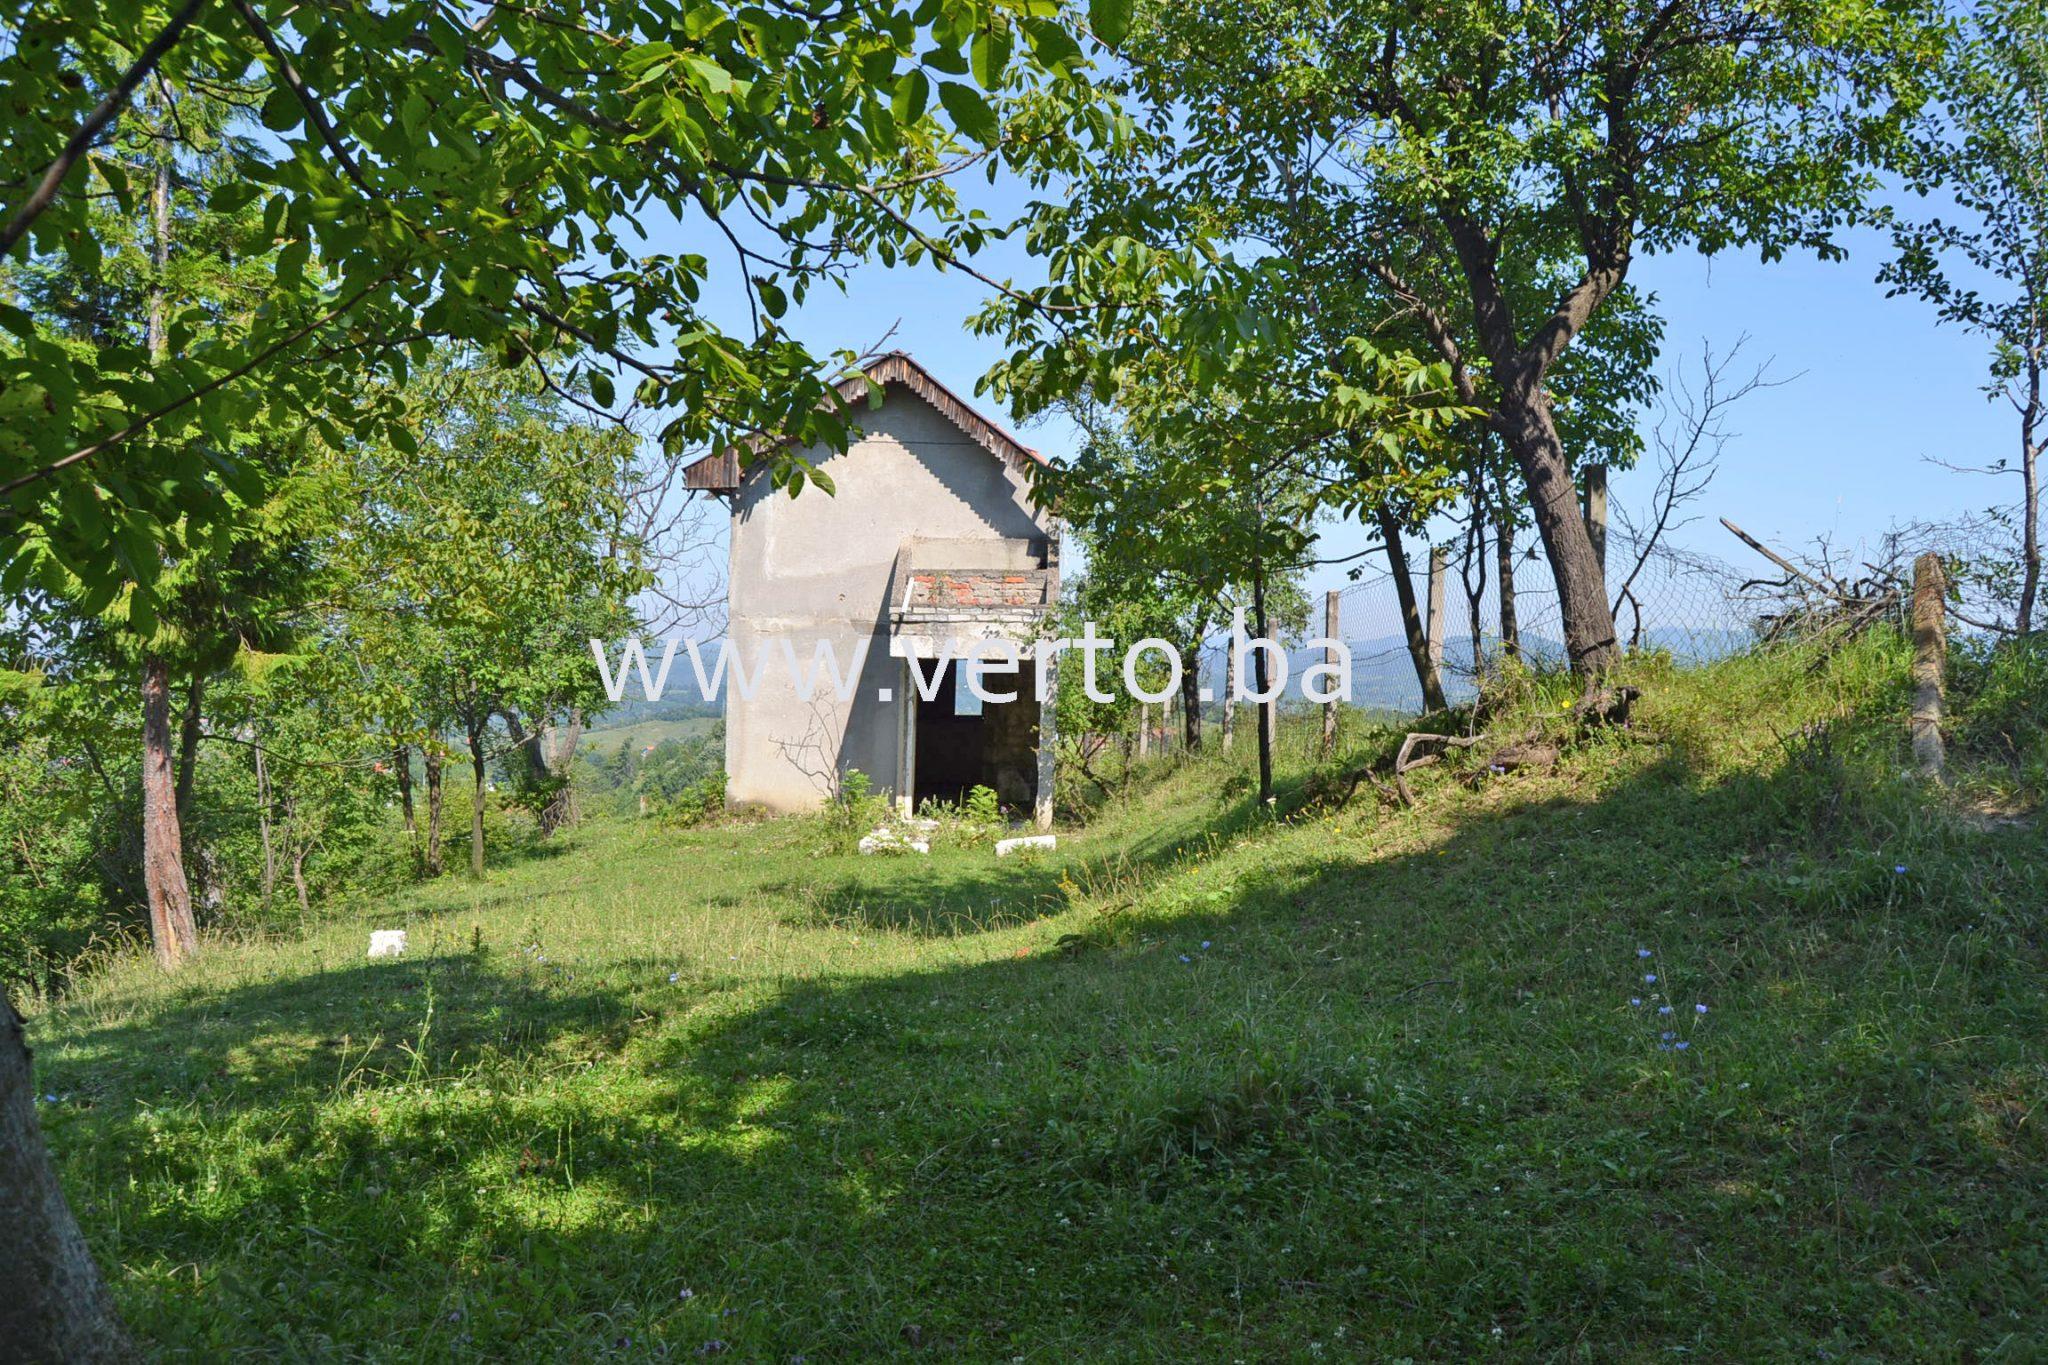 Zemljiste 1090 m2, vikendica 24 m2, Vasici, Tuzla